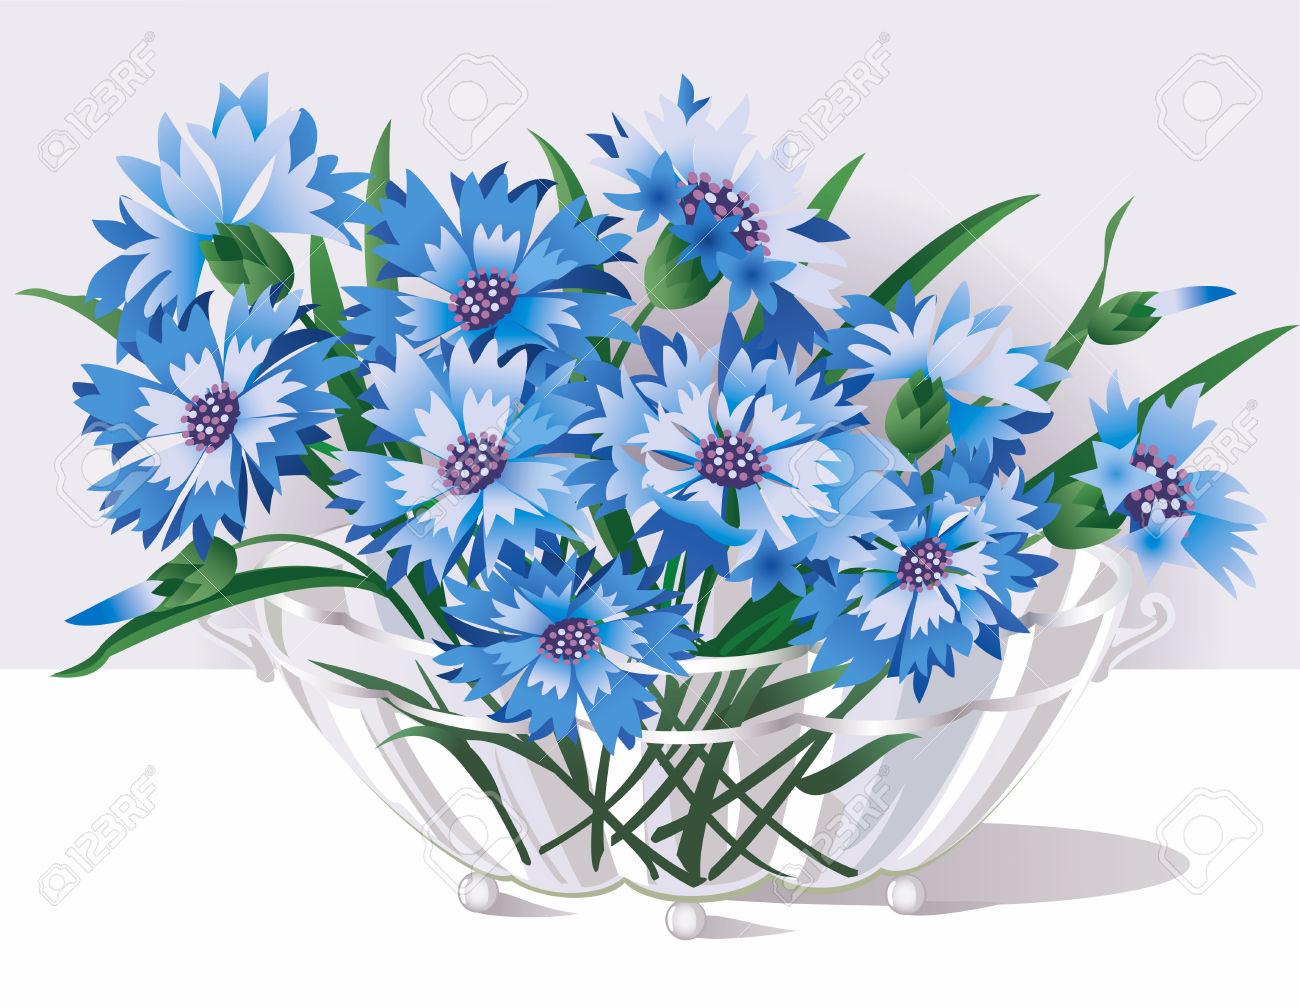 Cornflower Blue Flower Clip Art.